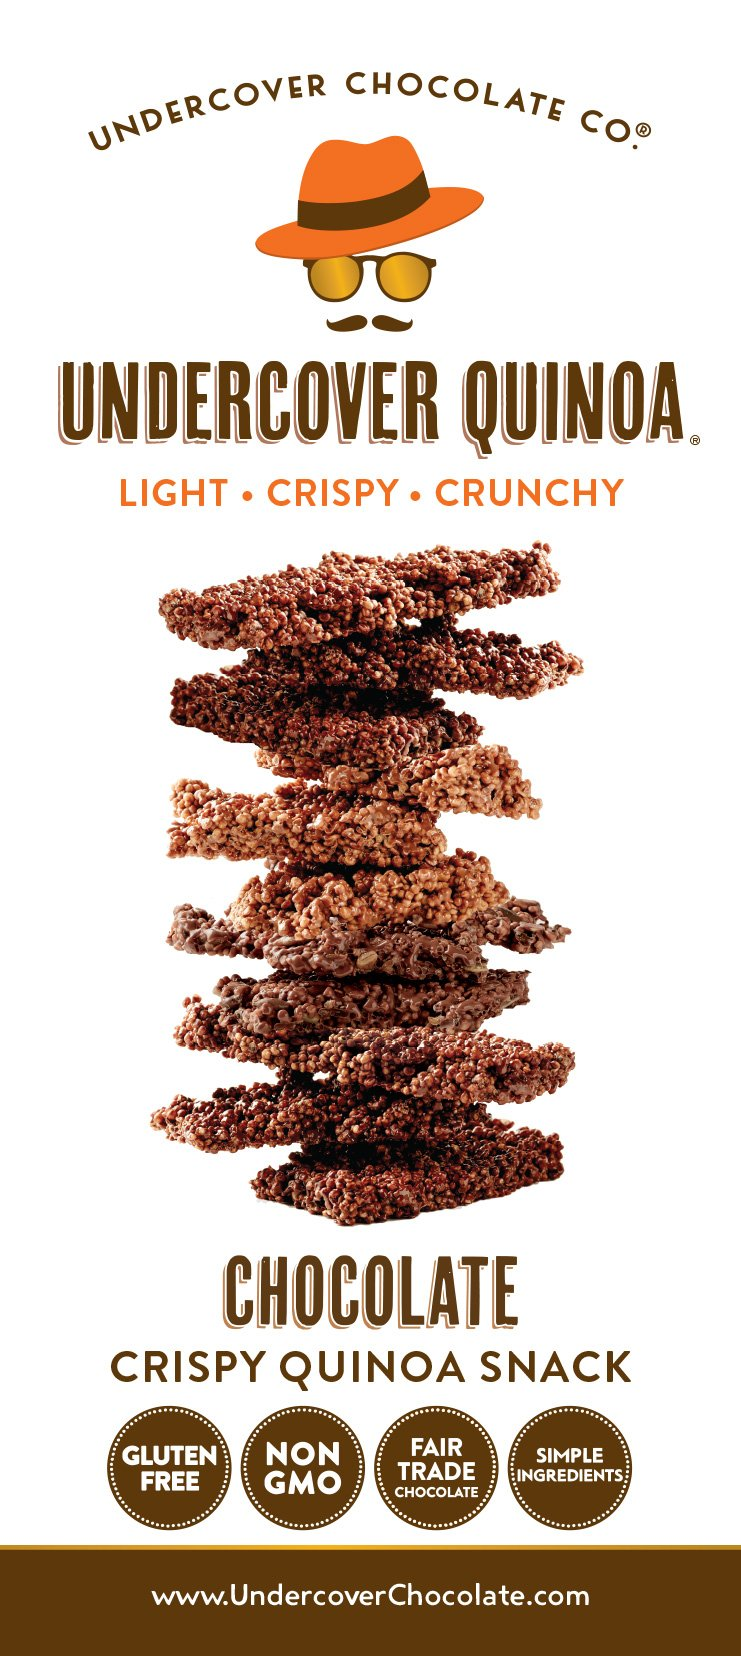 UNDERCOVER CHOCOLATE CO Milk Chocolate Quinoa Snack, 2 OZ